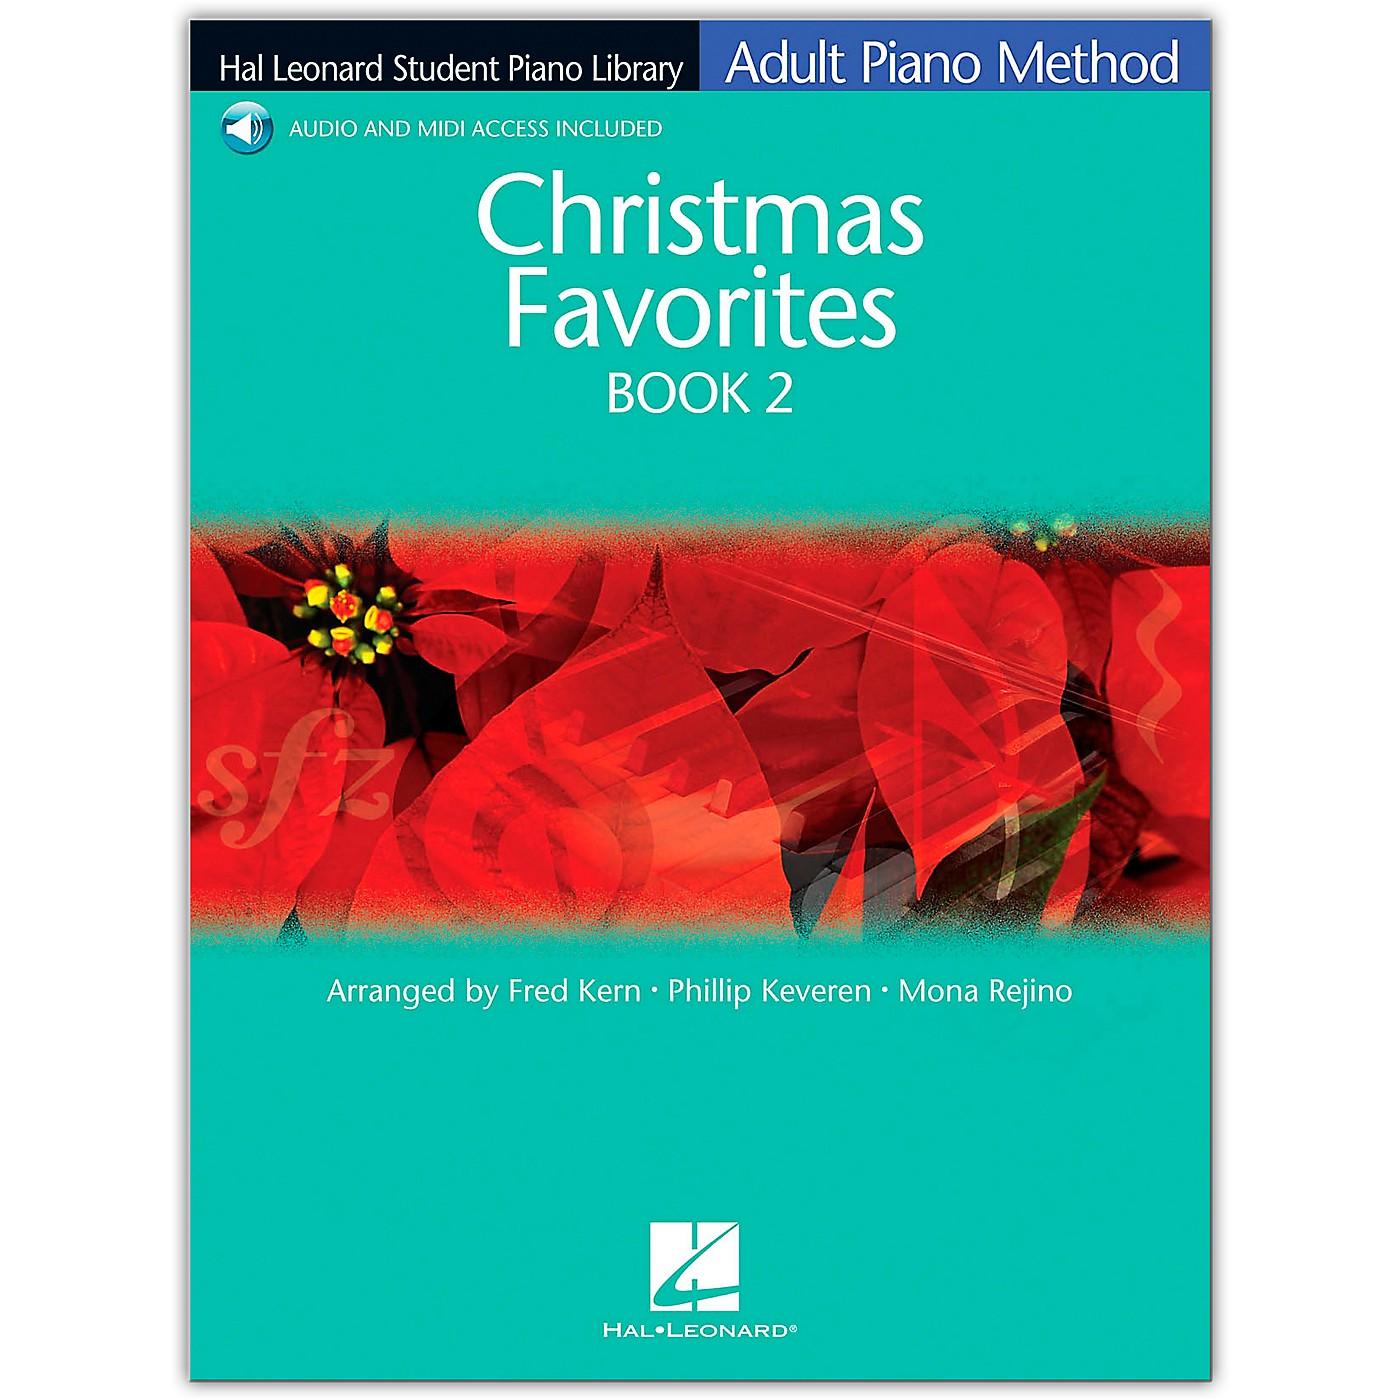 Hal Leonard Christmas Favorites Book/Online Audio 2 Adult Piano Method Hal Leonard Student Piano Library Book/Online Audio thumbnail